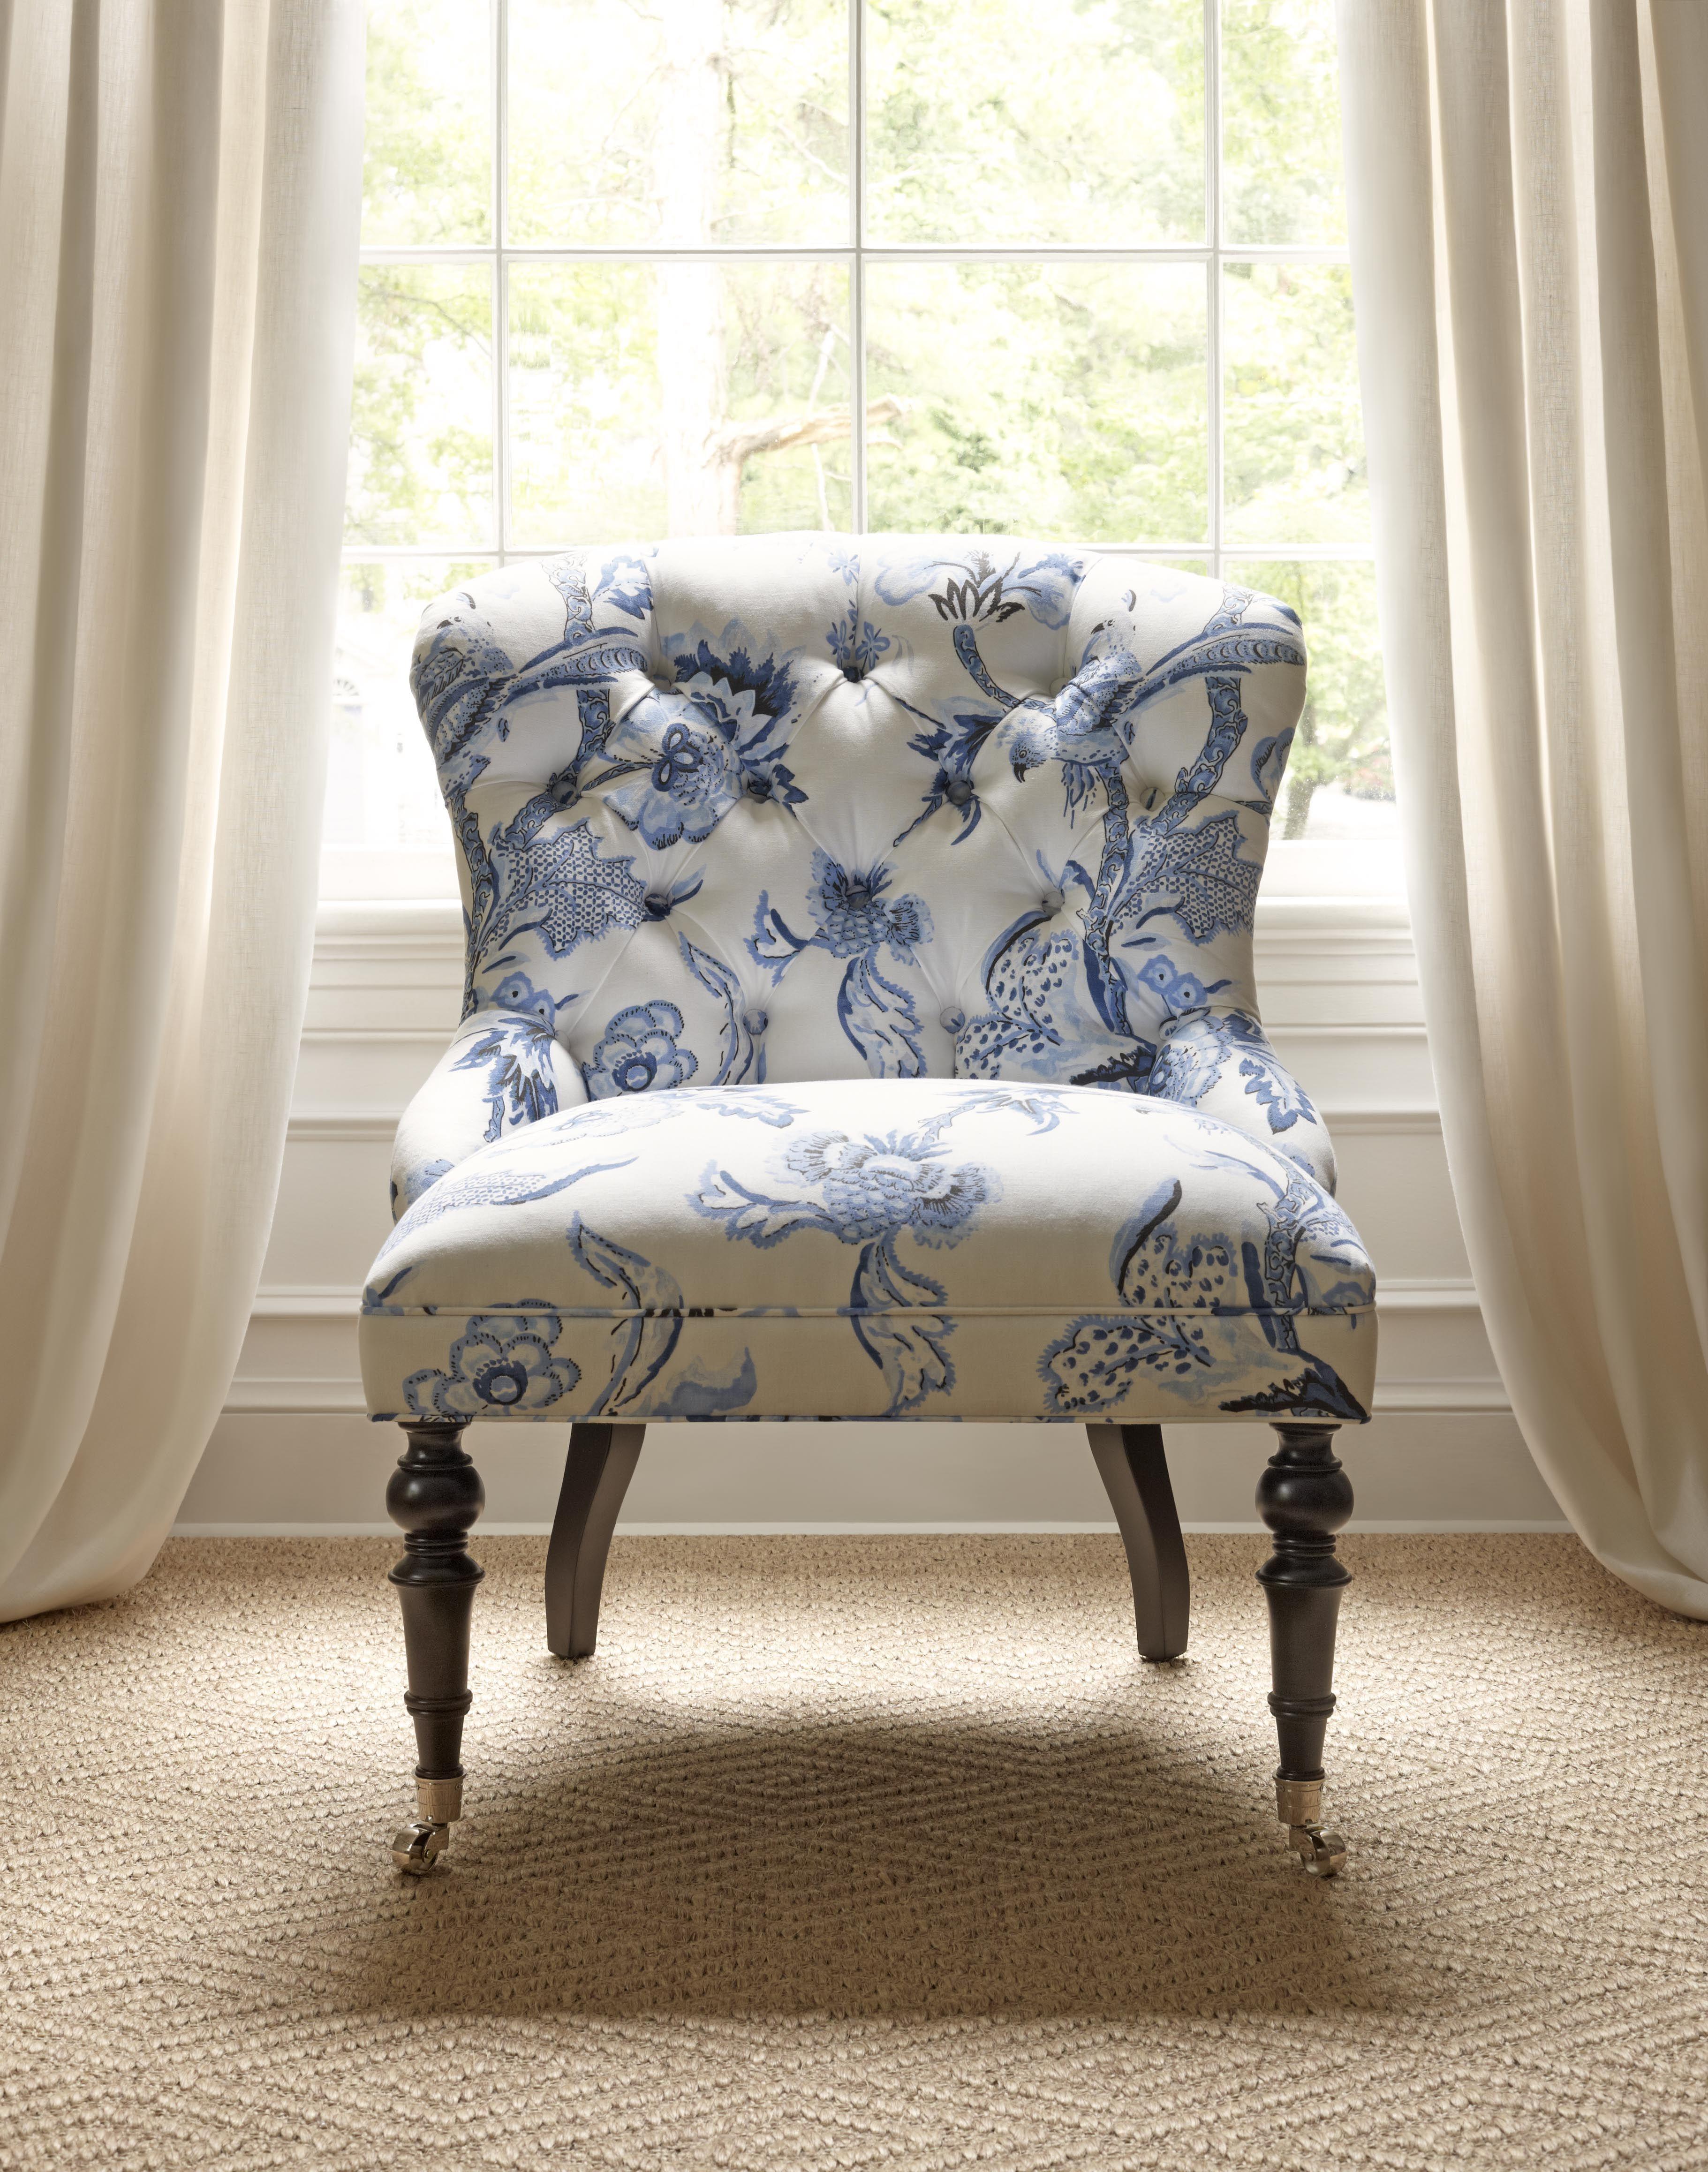 Middleton Chair in Shrewsbury Blue & White Thibaut